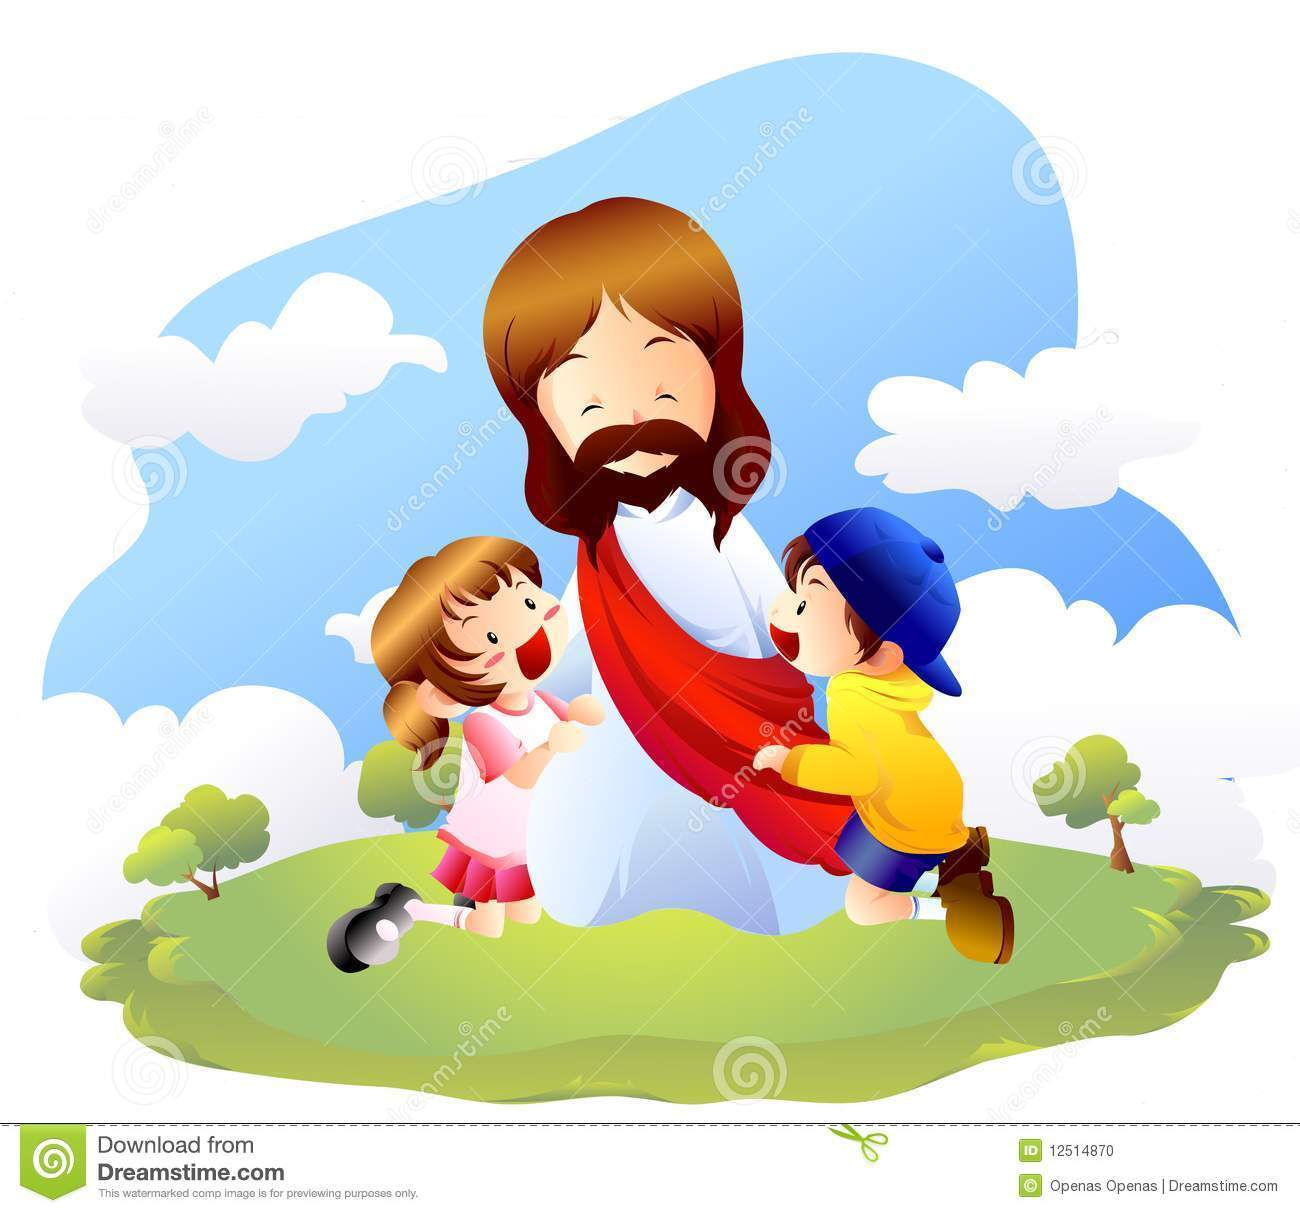 Jesus loves children clipart 1 » Clipart Portal.